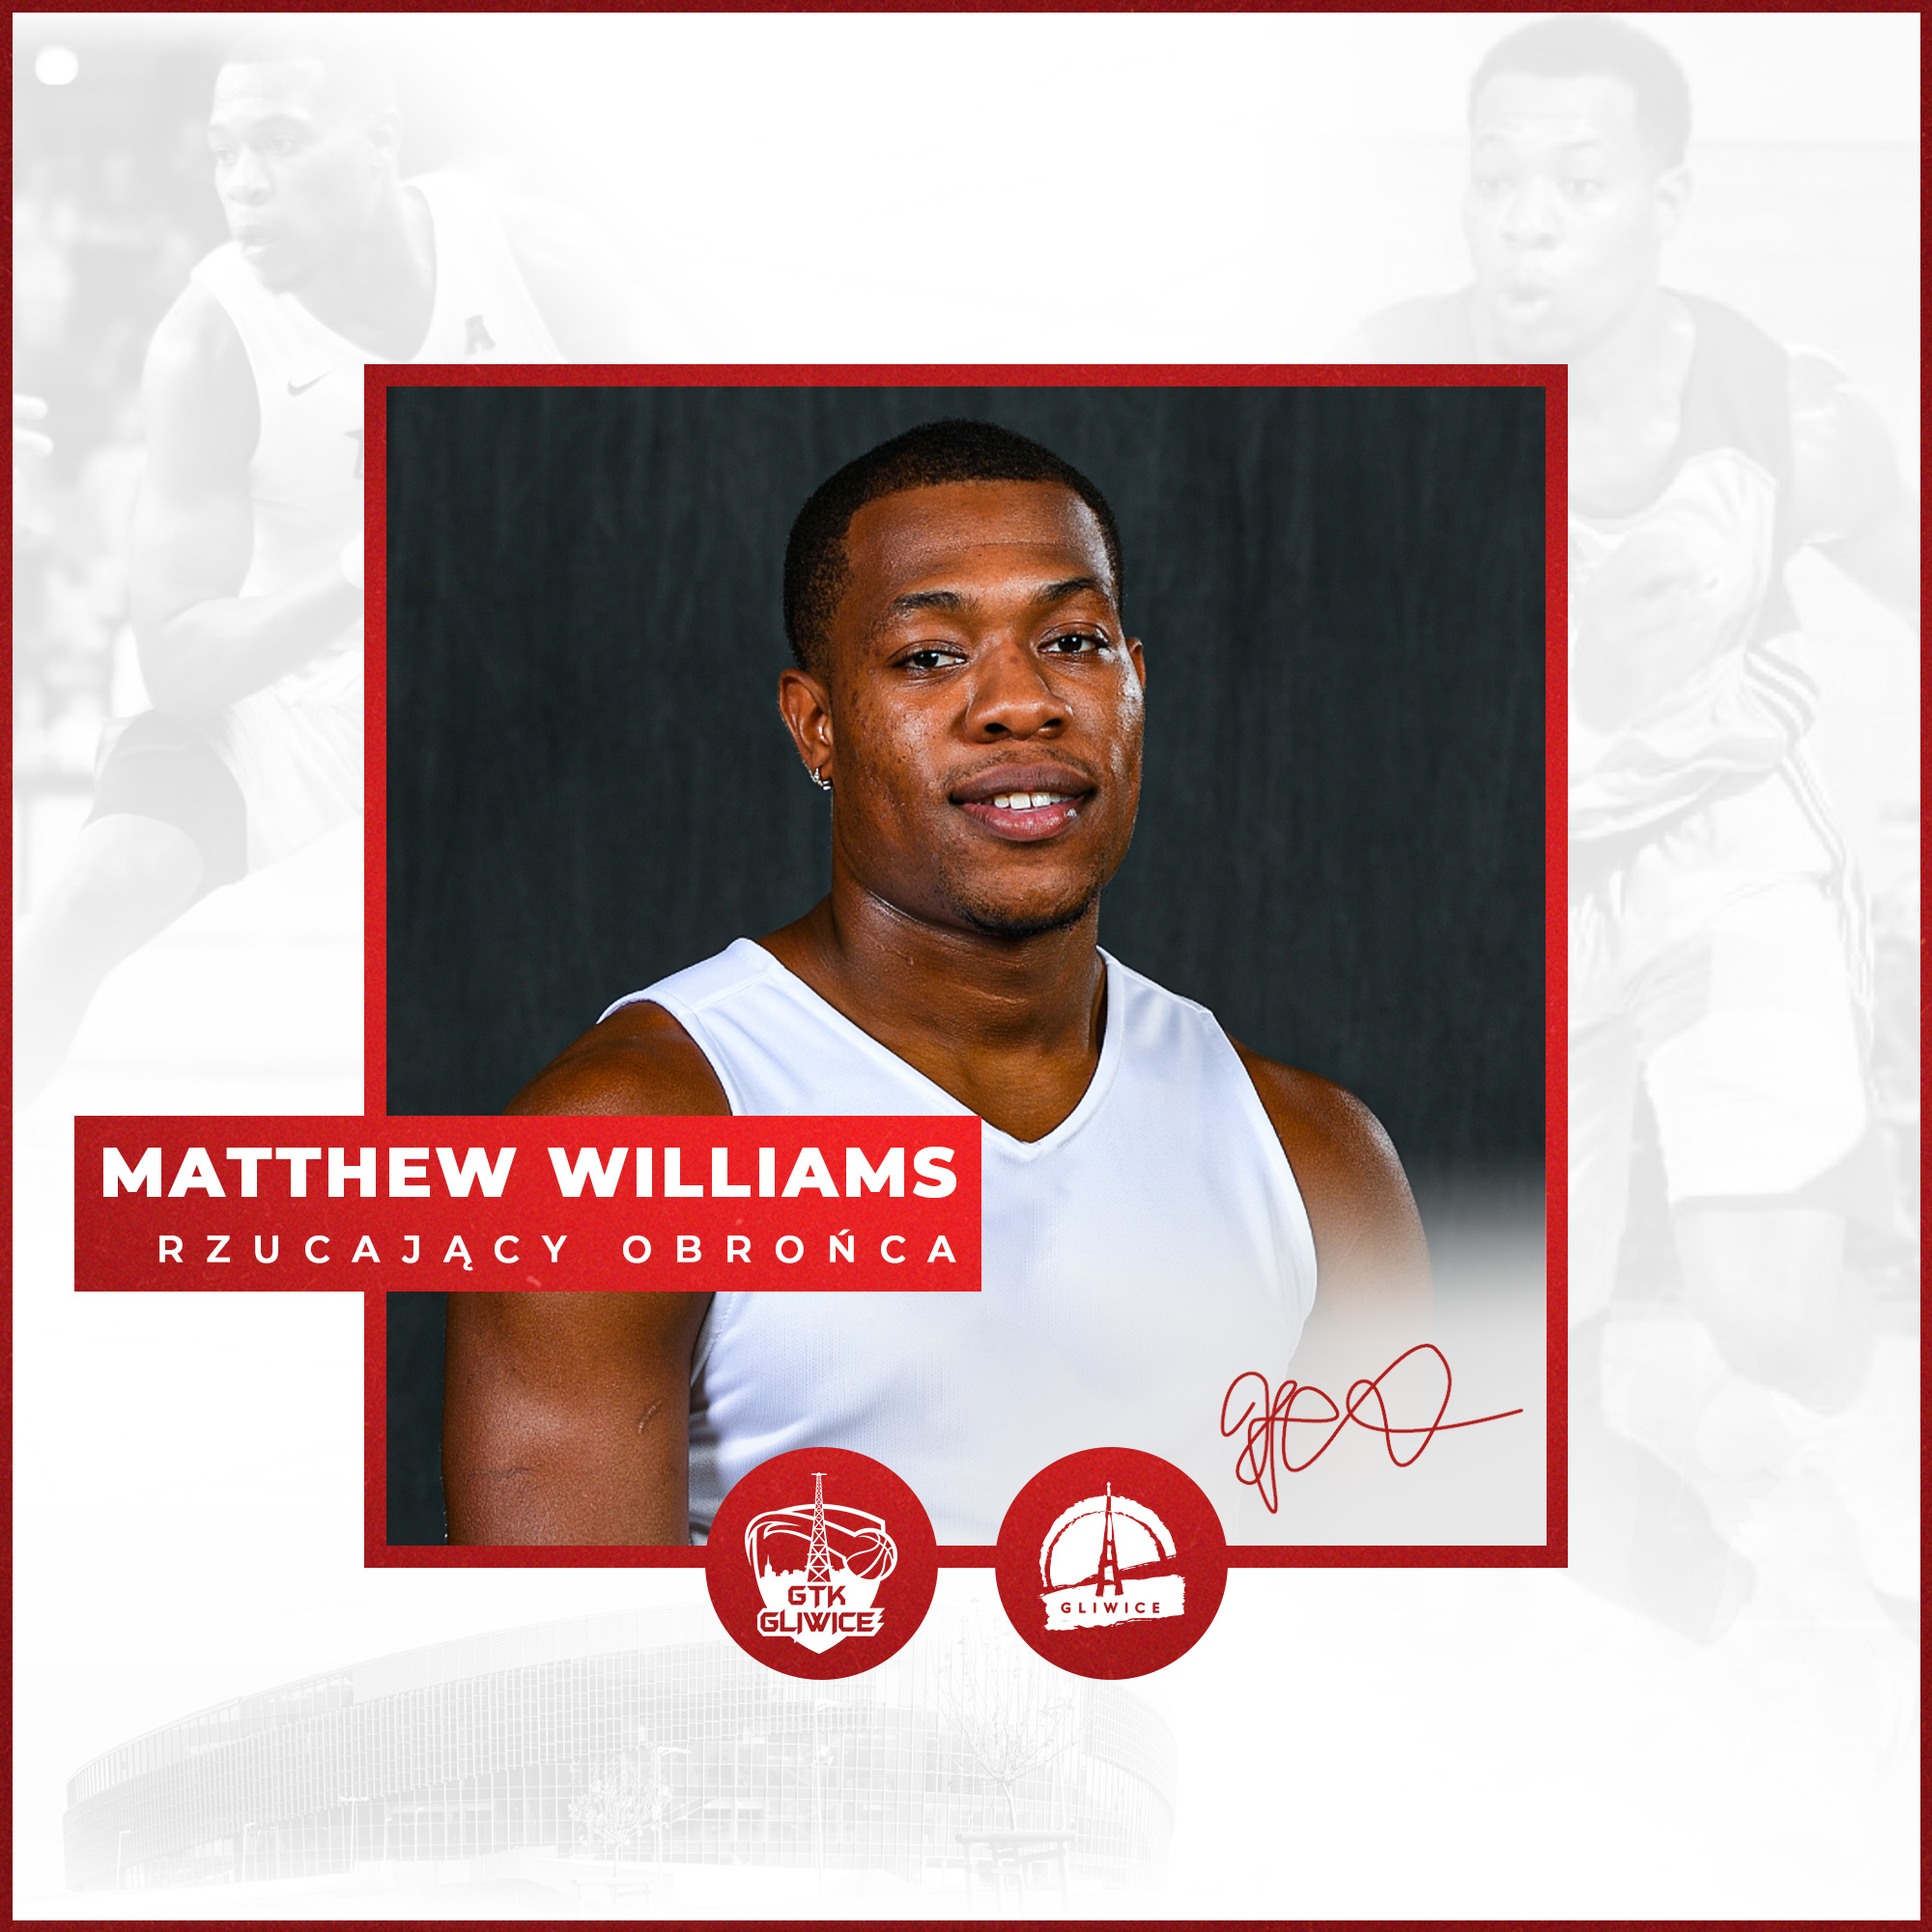 Matthew Williams